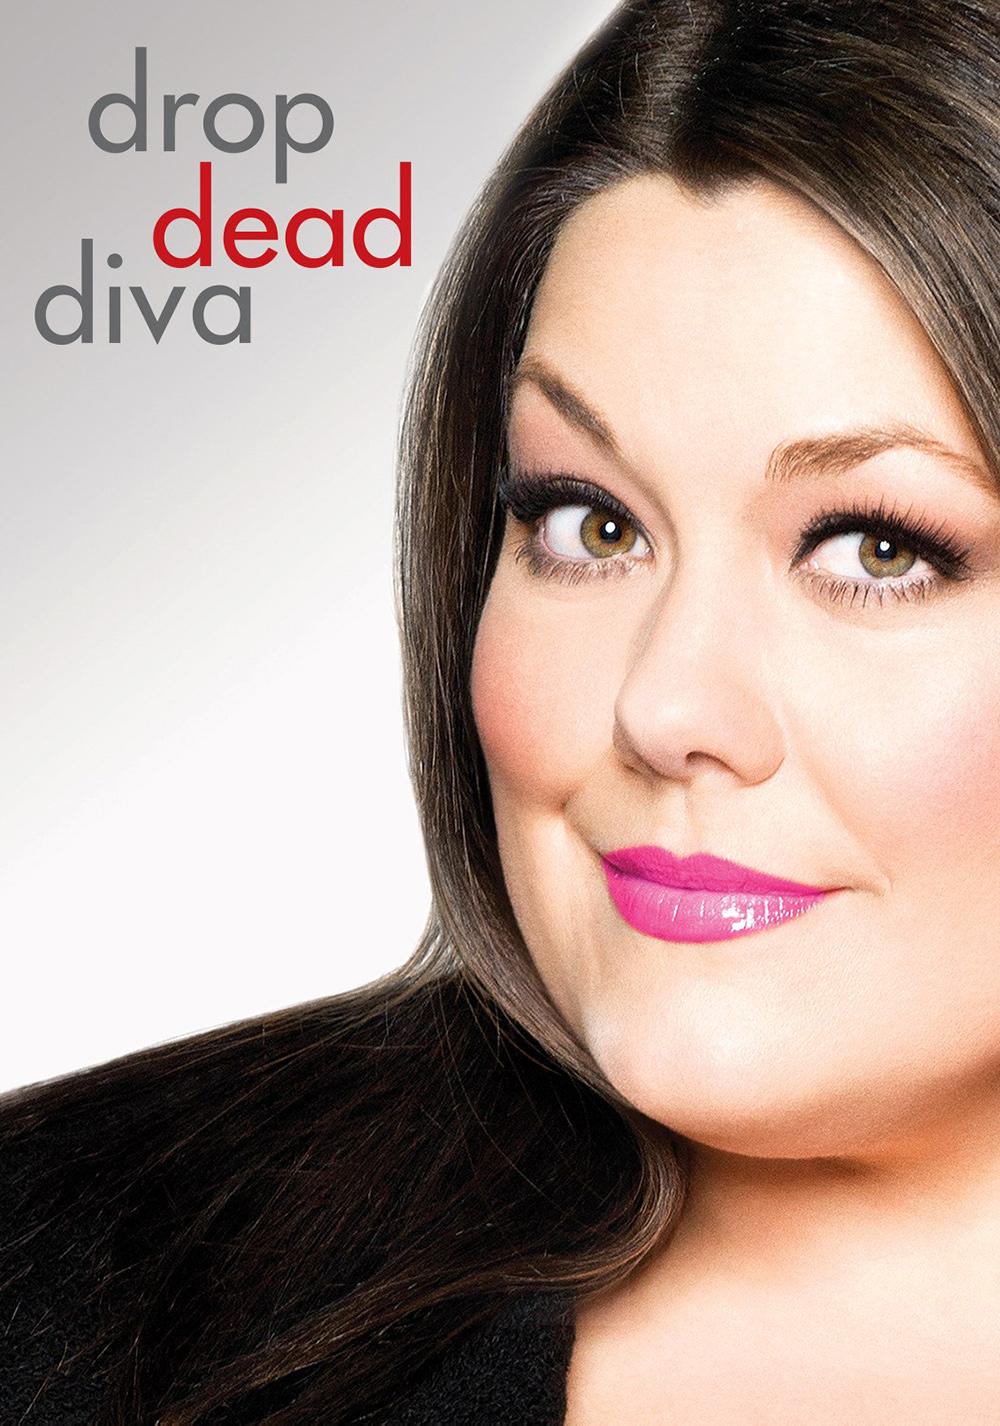 Drop dead diva s03e03 hdtv xvid asap avi markottlin - Drop dead diva season 4 torrent ...